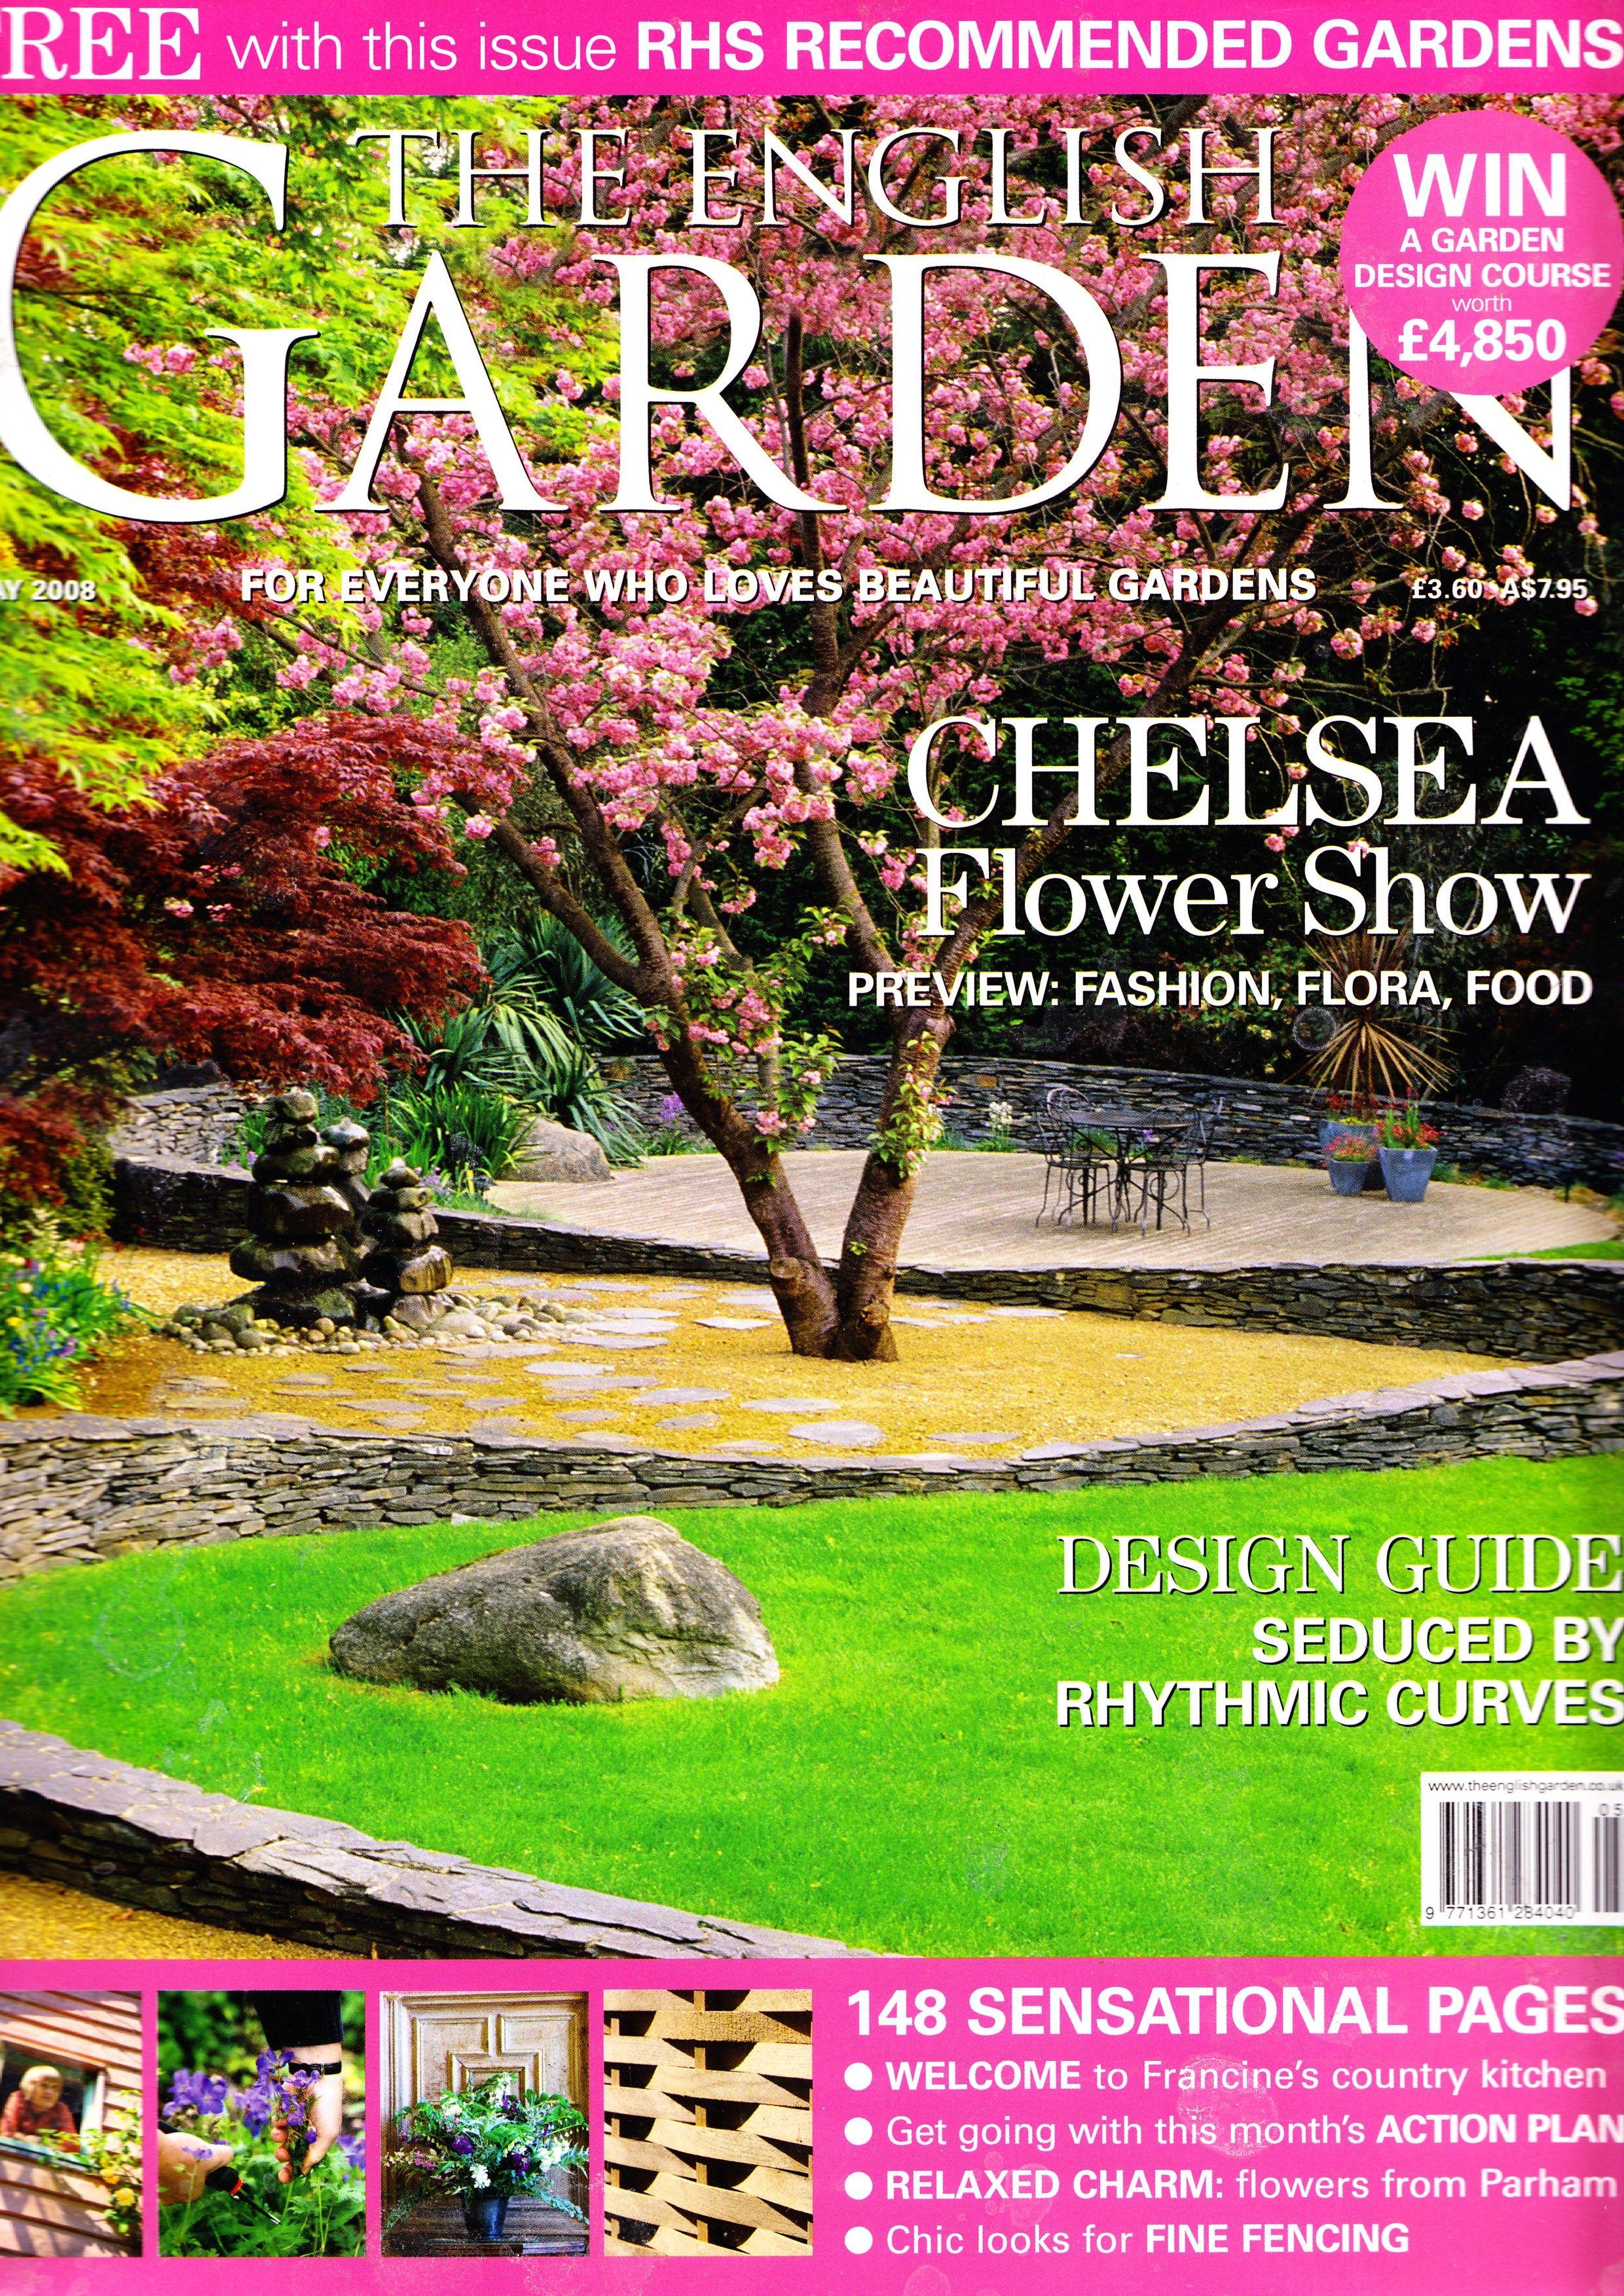 Publication Cover Foster Garden Chelsea Flower Show Beautiful Gardens Design Guide